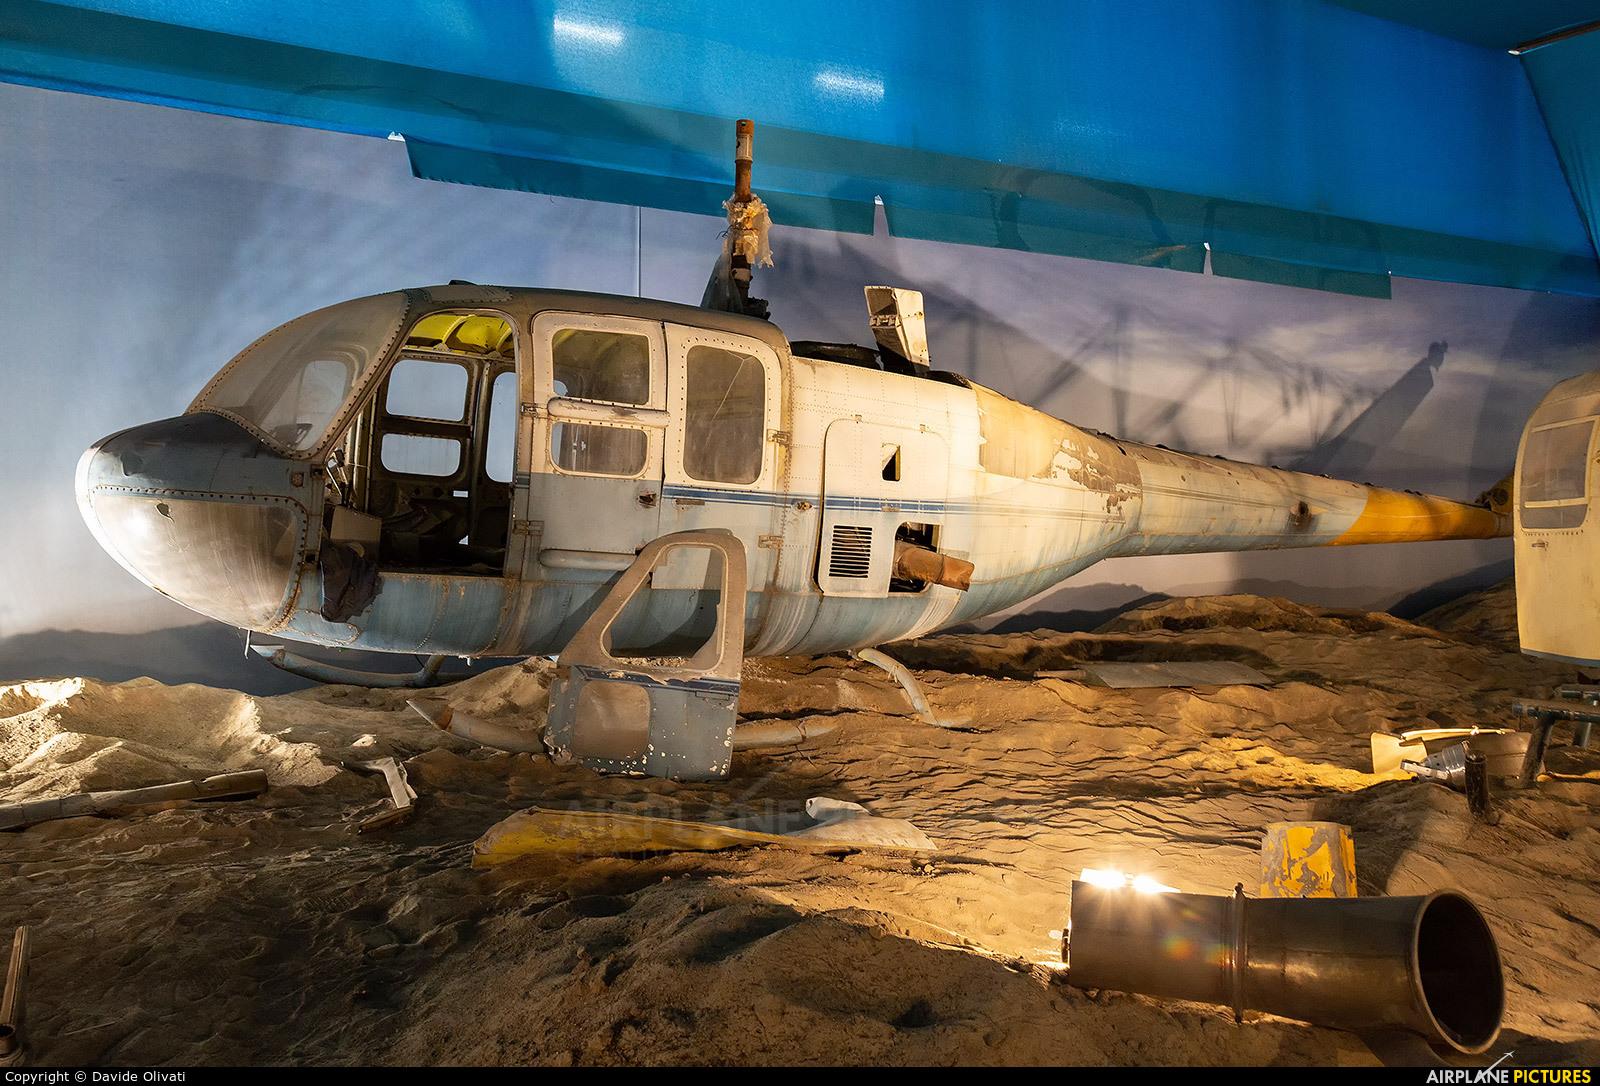 Private I-001 aircraft at Milan -  Volandia Aviation Museum